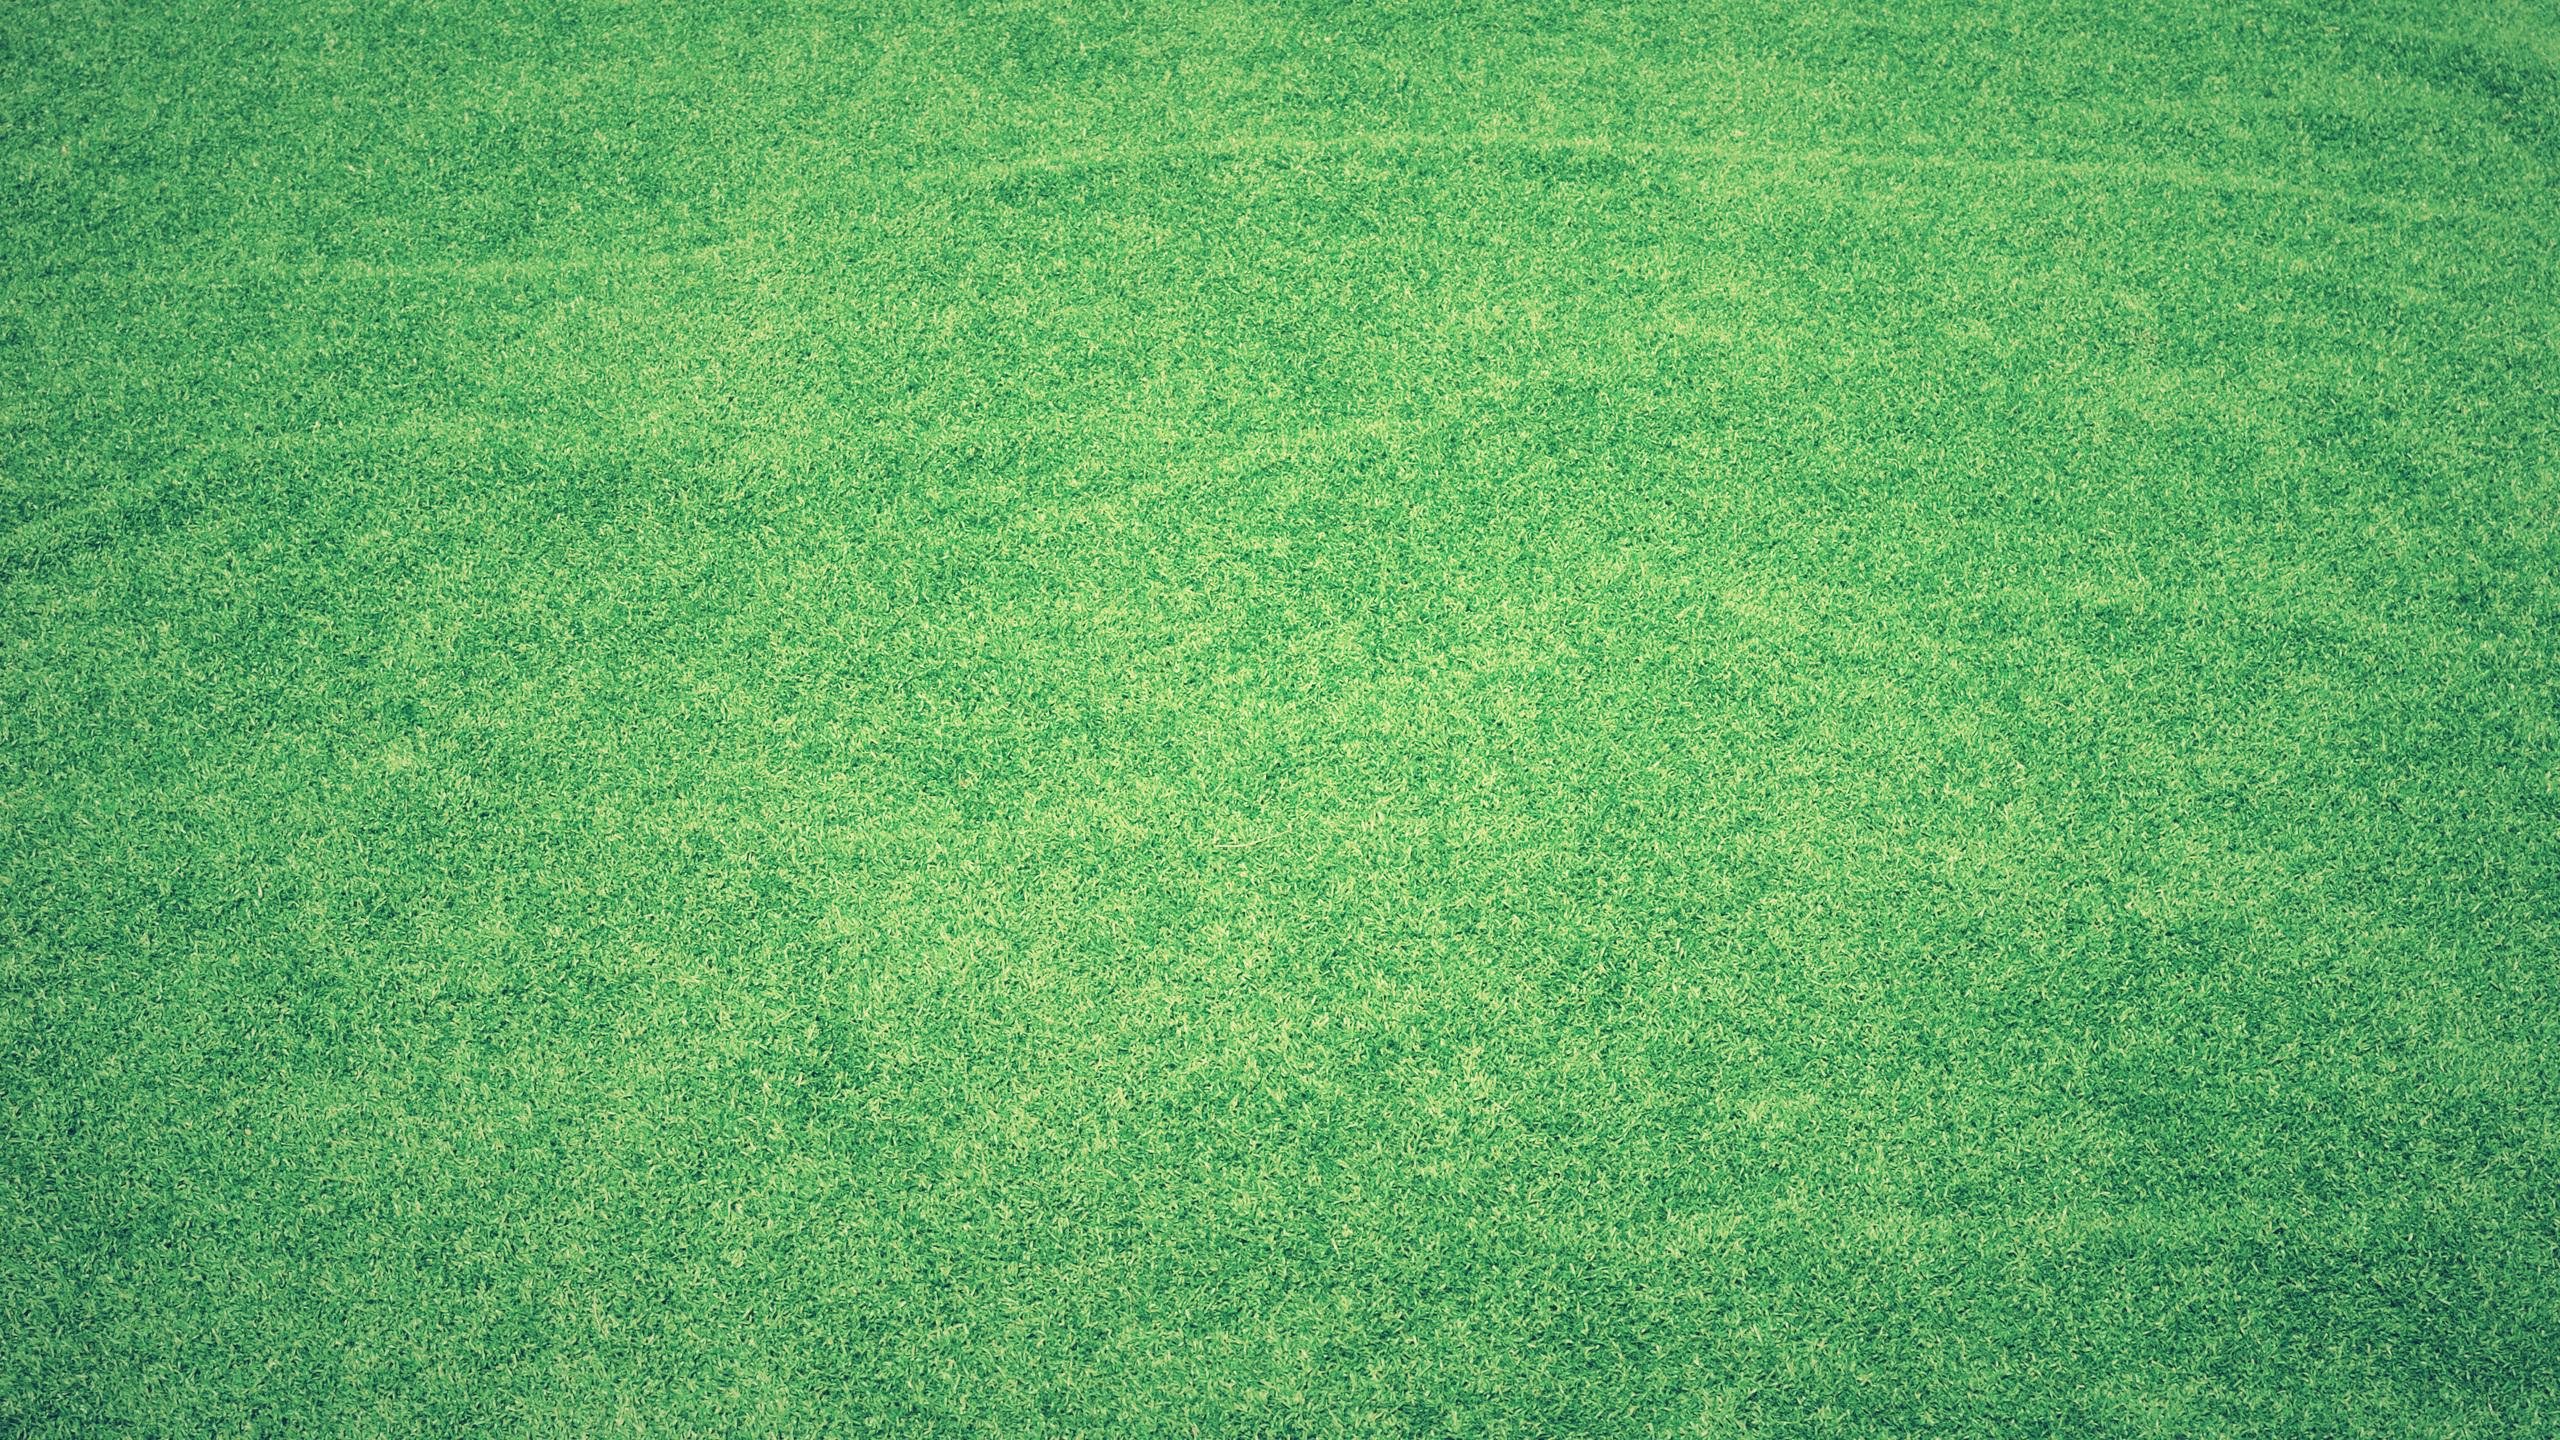 grass-abstract-background-4k-ok.jpg